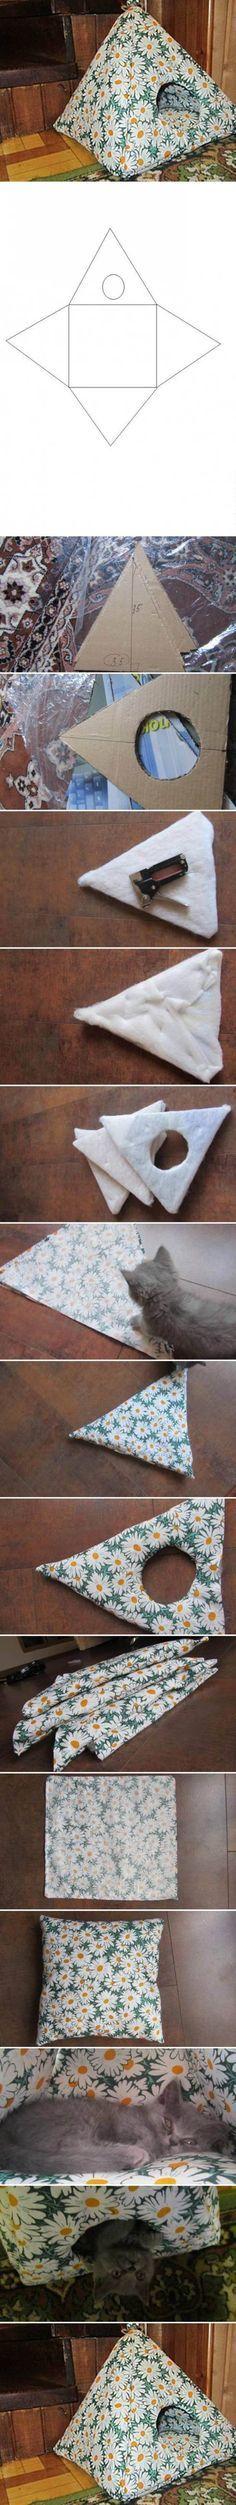 Easy DIY Cat Tent